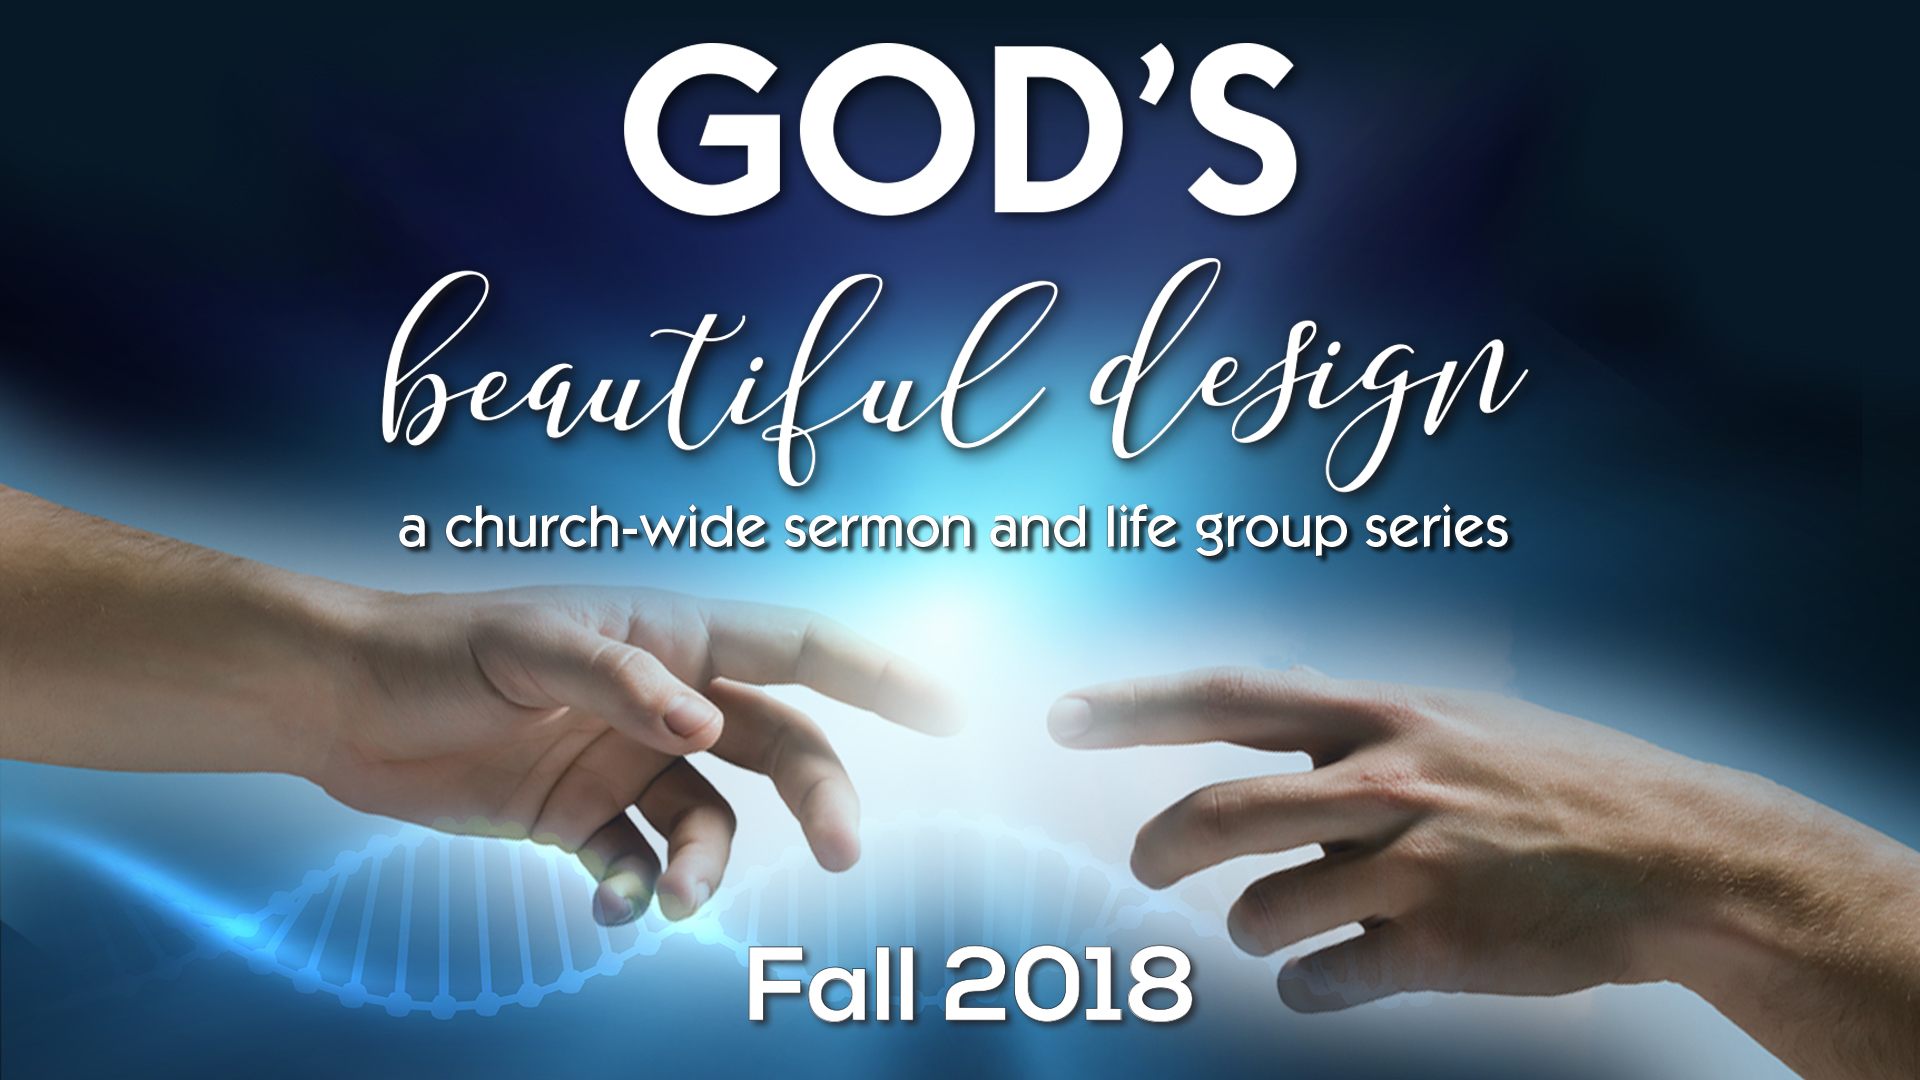 God's Beautiful design, sermon series, life group series, Gulf Gate Church, biblical sexuality